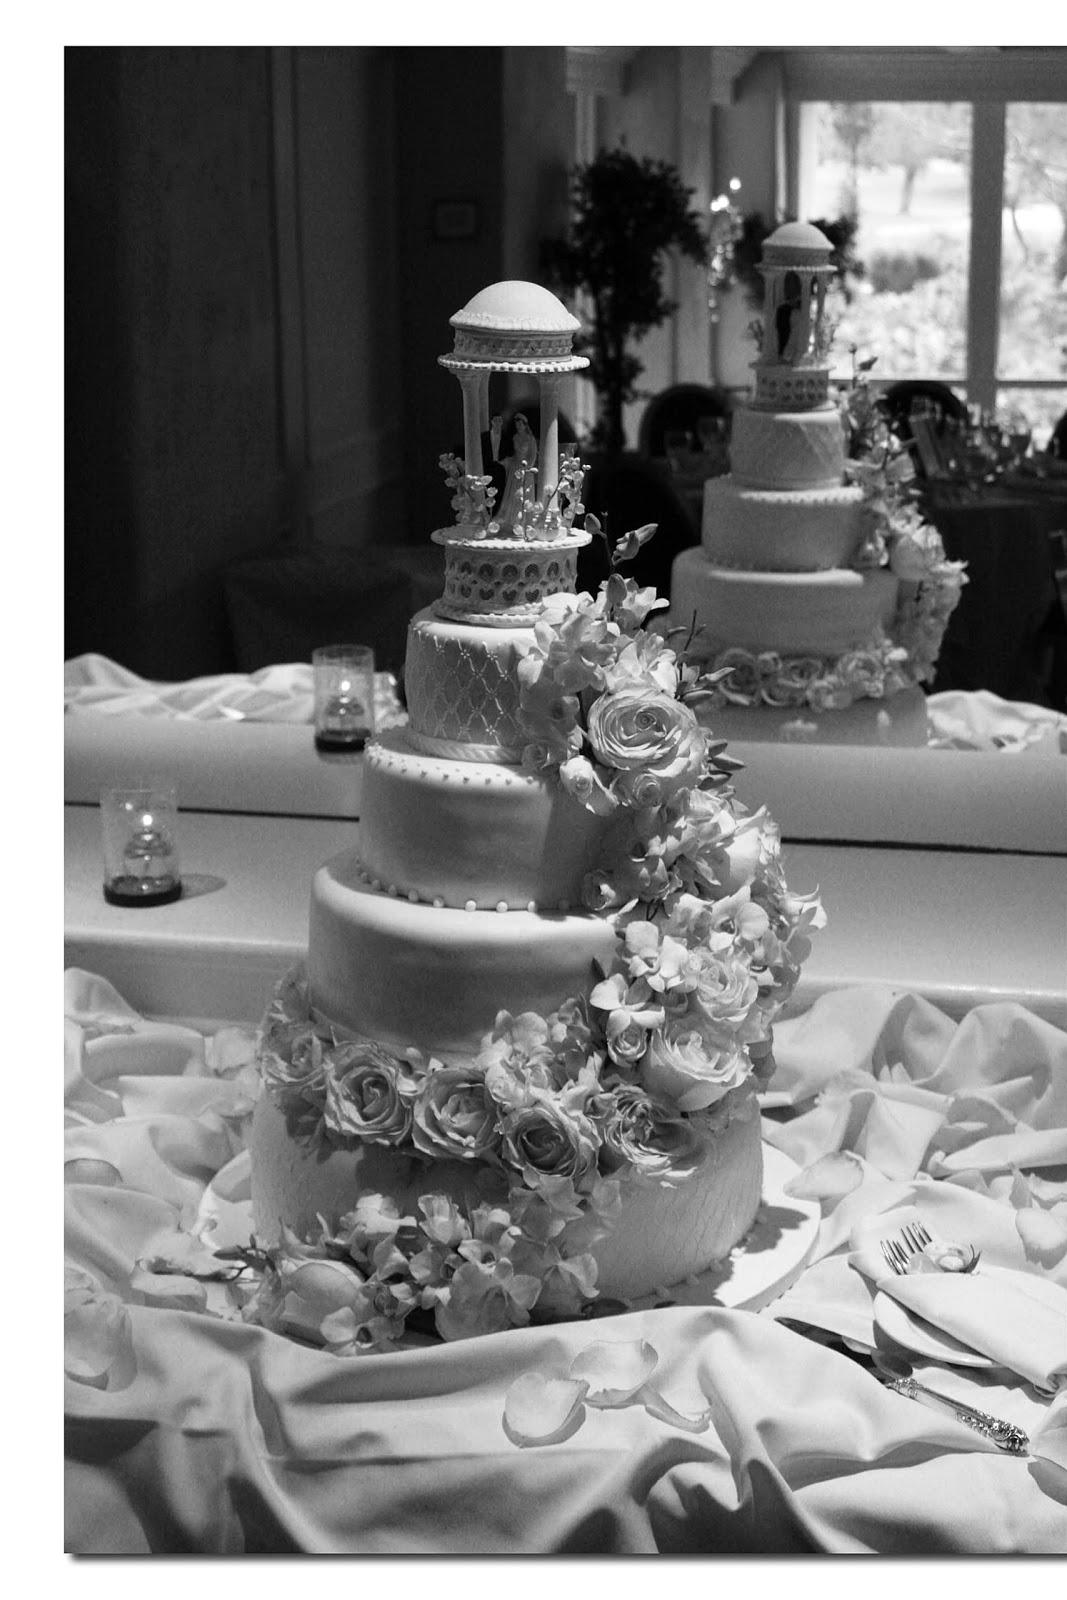 create their wedding cake